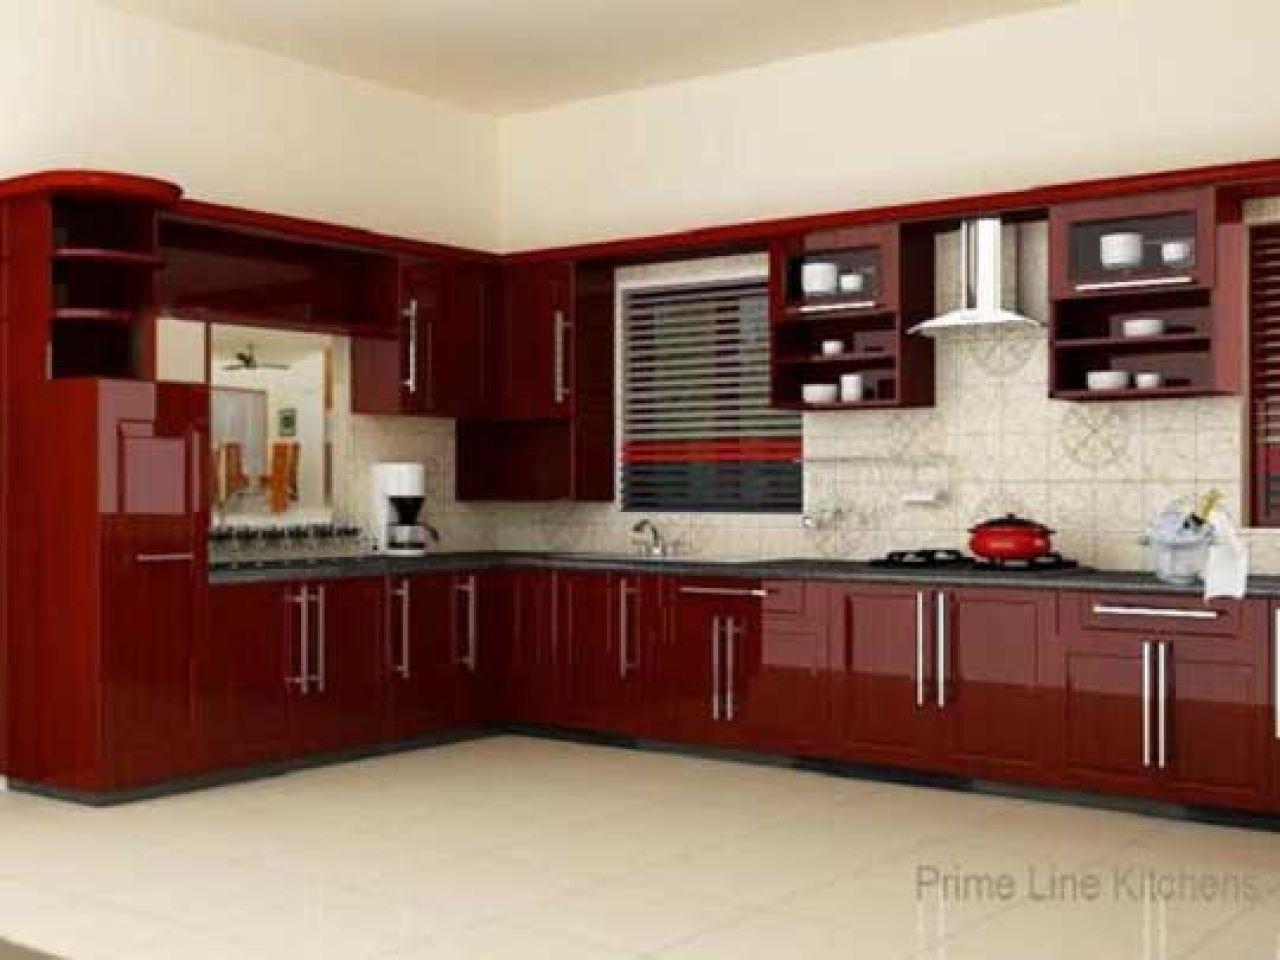 New Model Kitchen Design Kerala conexaowebmix.com ... on Model Kitchen Design  id=70618